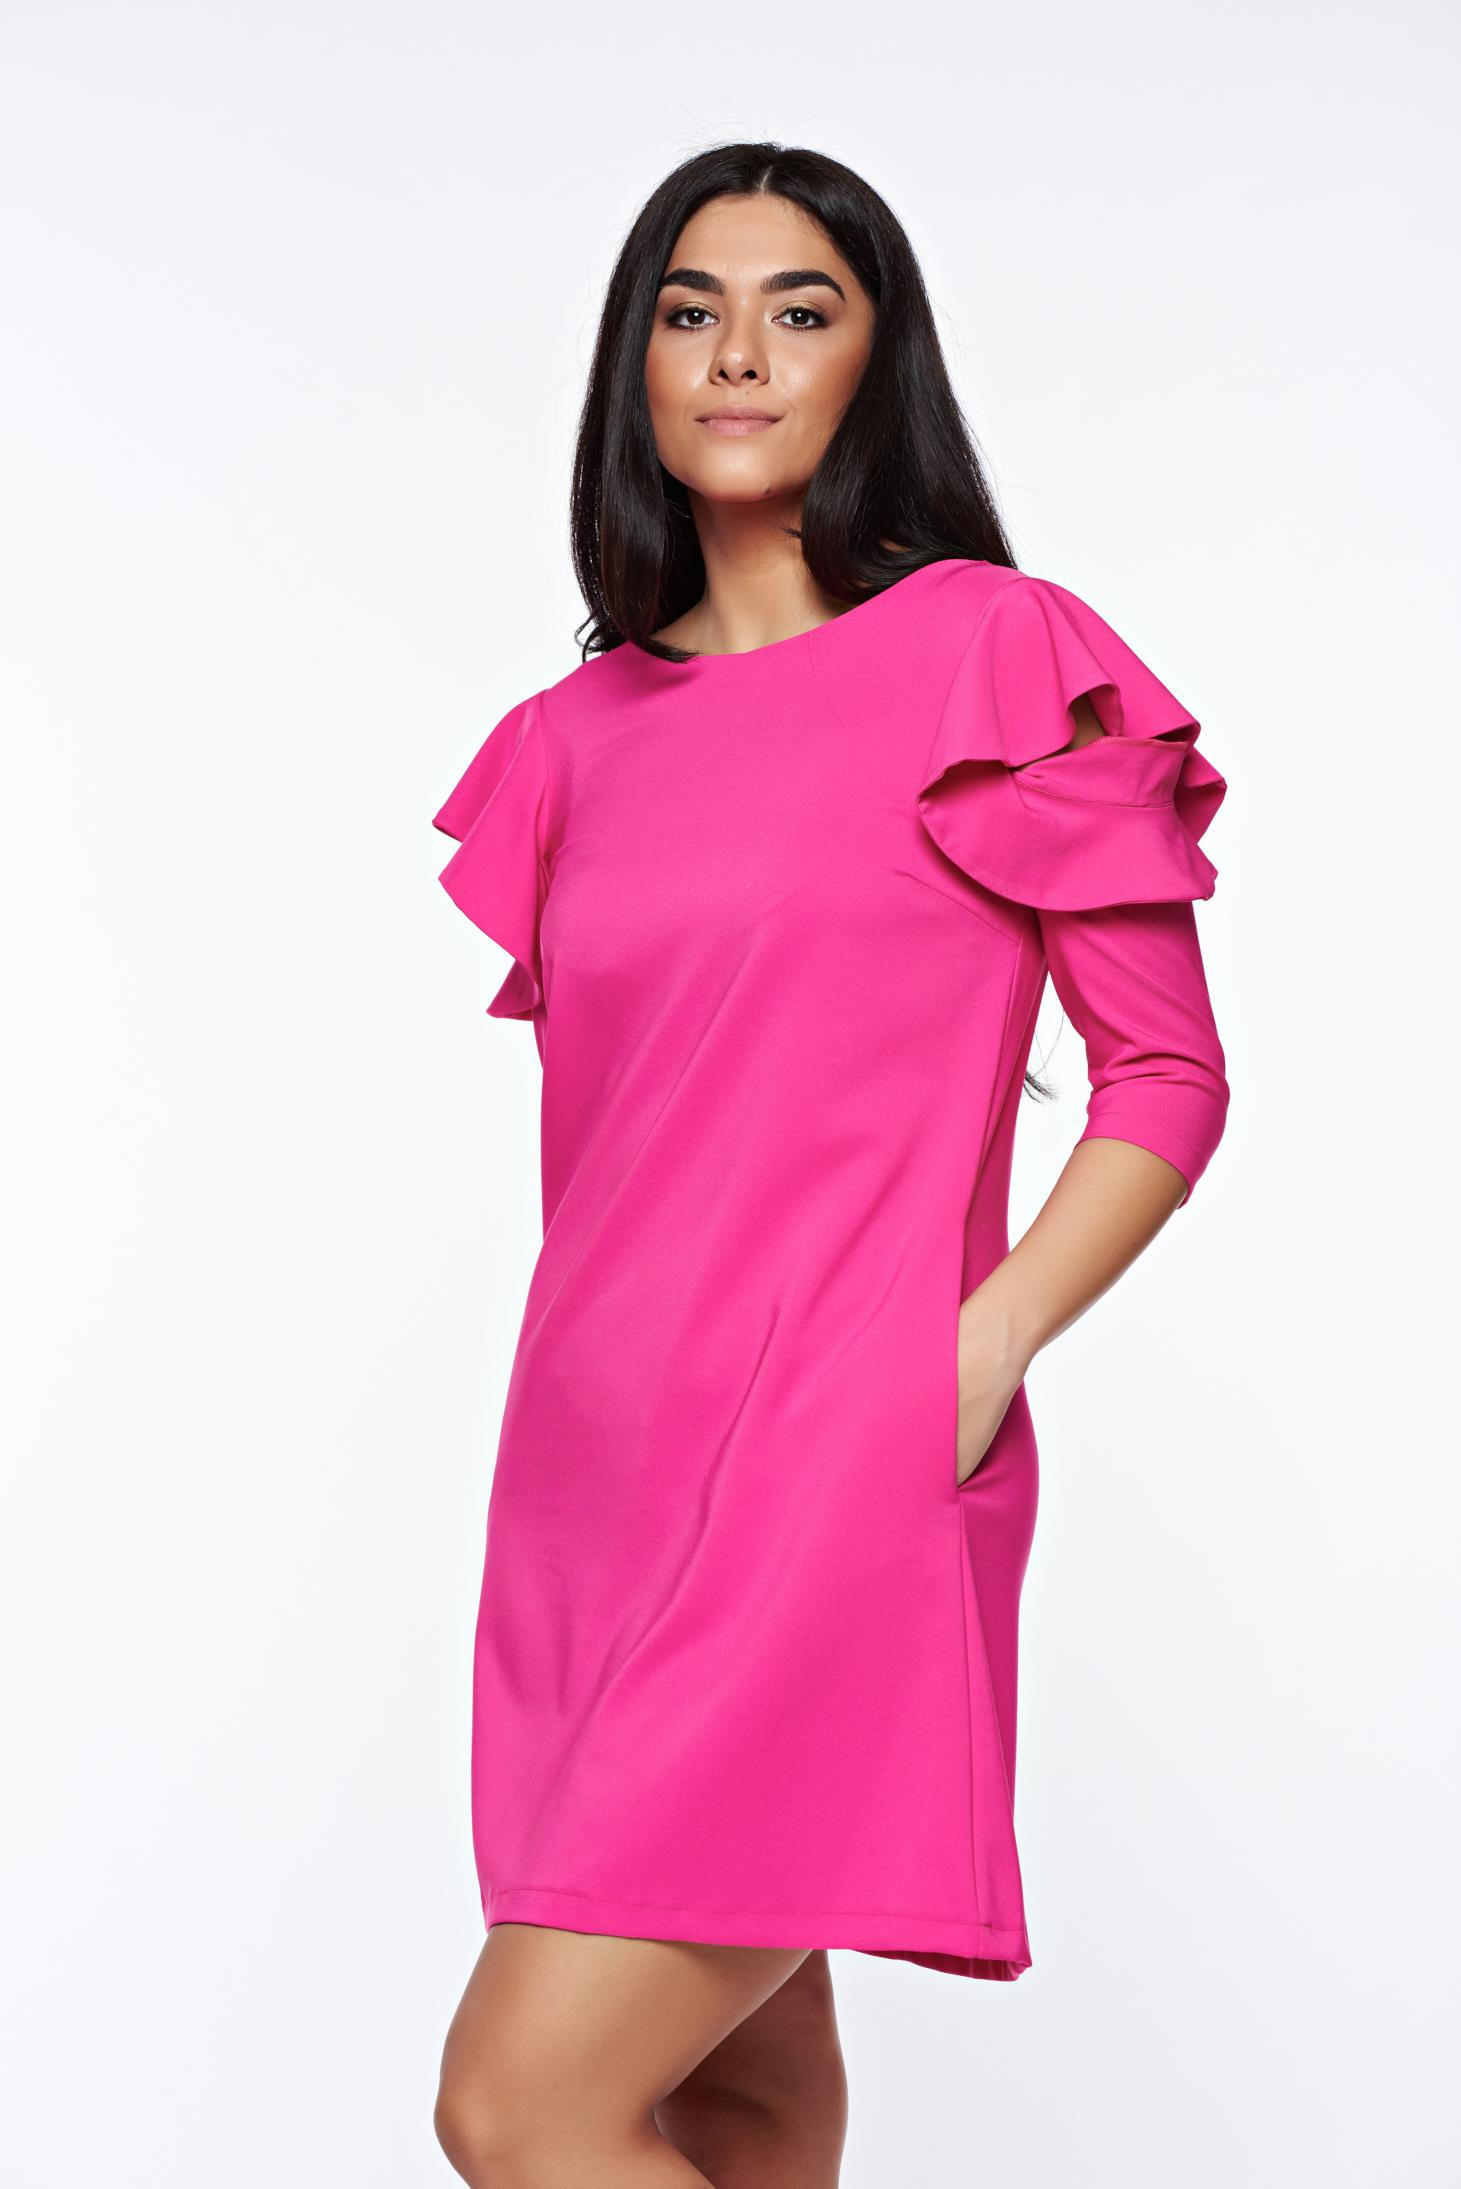 Rochie LaDonna roz cu croi larg din stofa usor elastica cu volanase la maneca